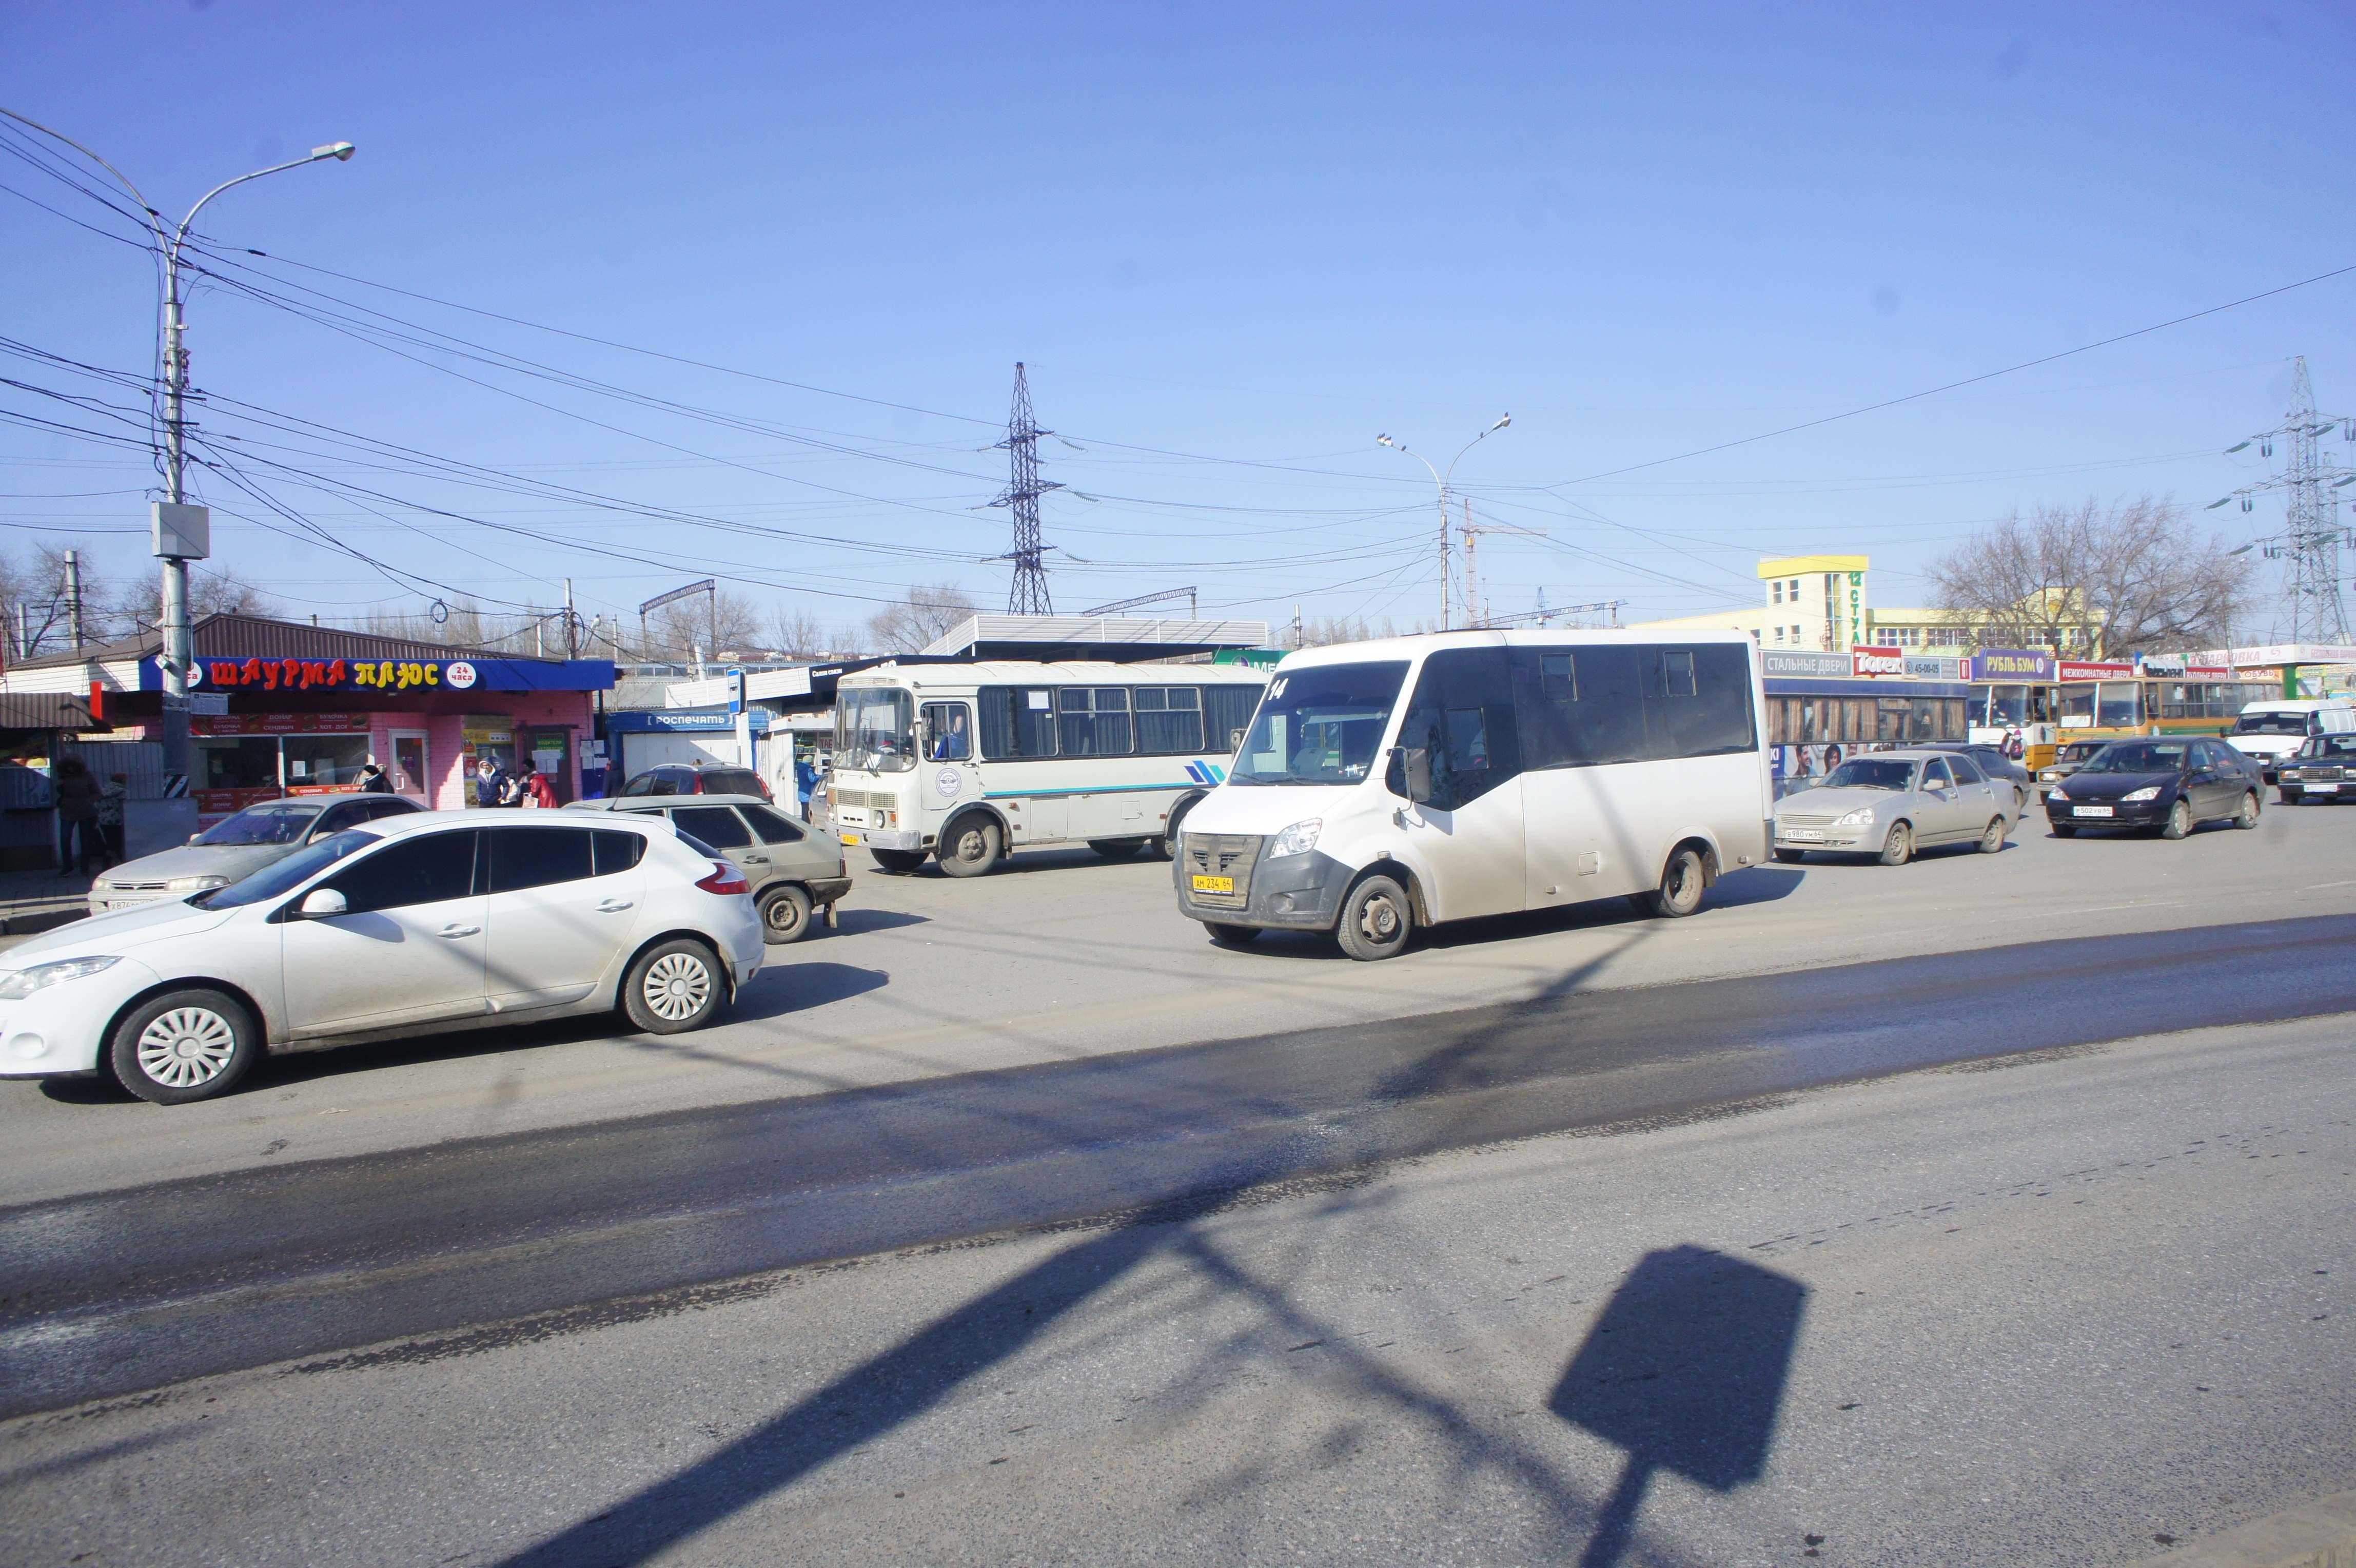 схема маршрутных такис махачкала схема маршрутных такси